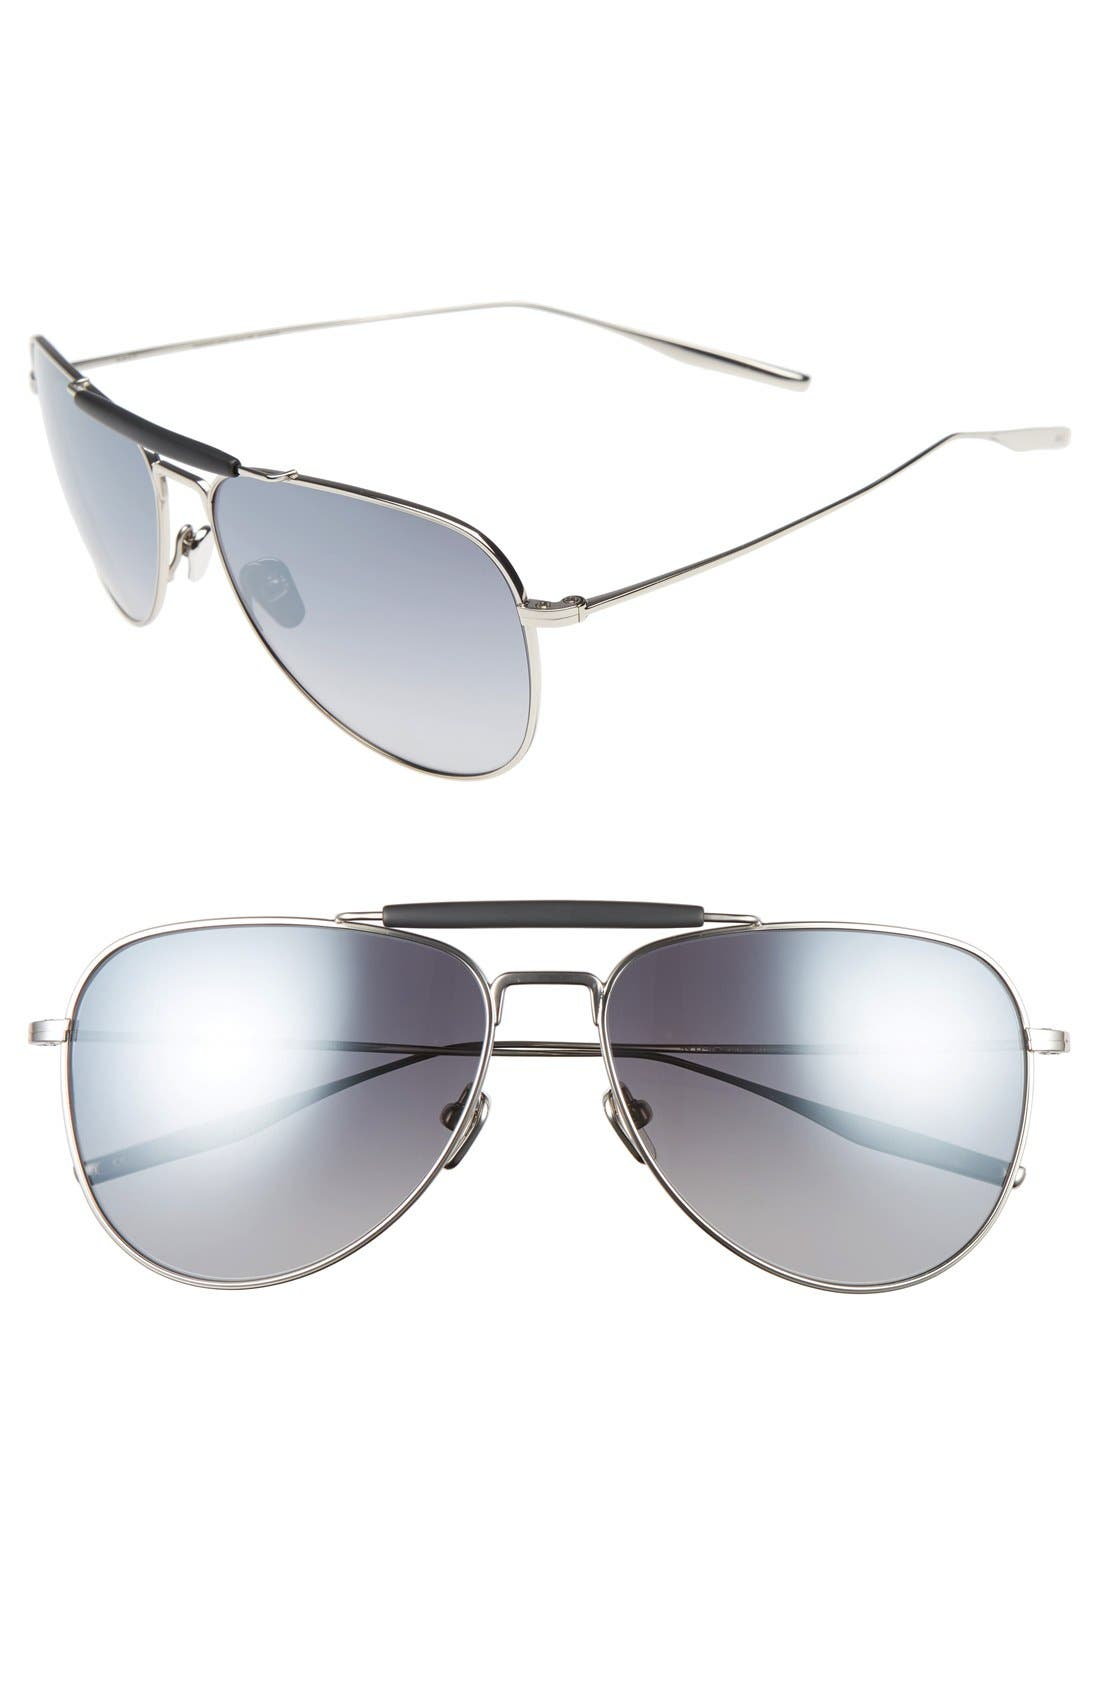 Striker 59mm Aviator Sunglasses,                             Alternate thumbnail 5, color,                             TRADITIONAL SILVER